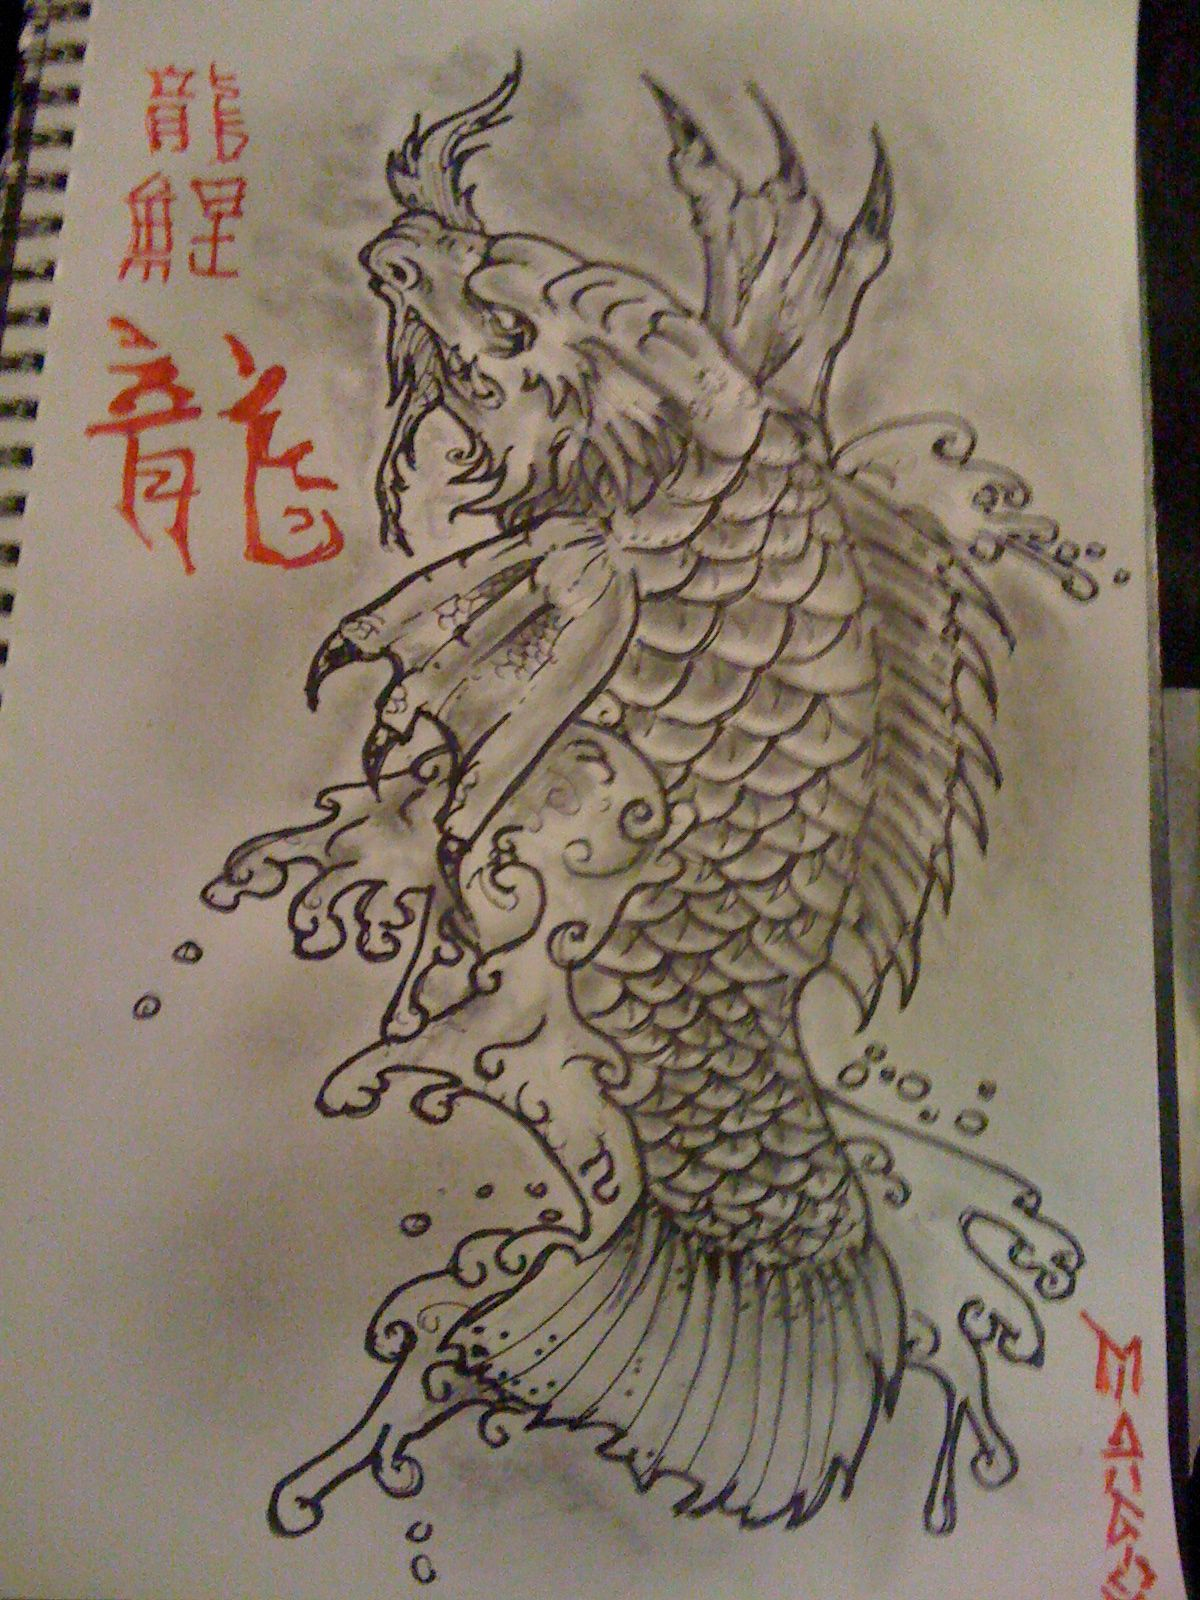 Koi Dragon Tattoo Design Pencil And Ink Koi Dragon Tattoo Dragon Tattoo Drawing Tattoo Designs